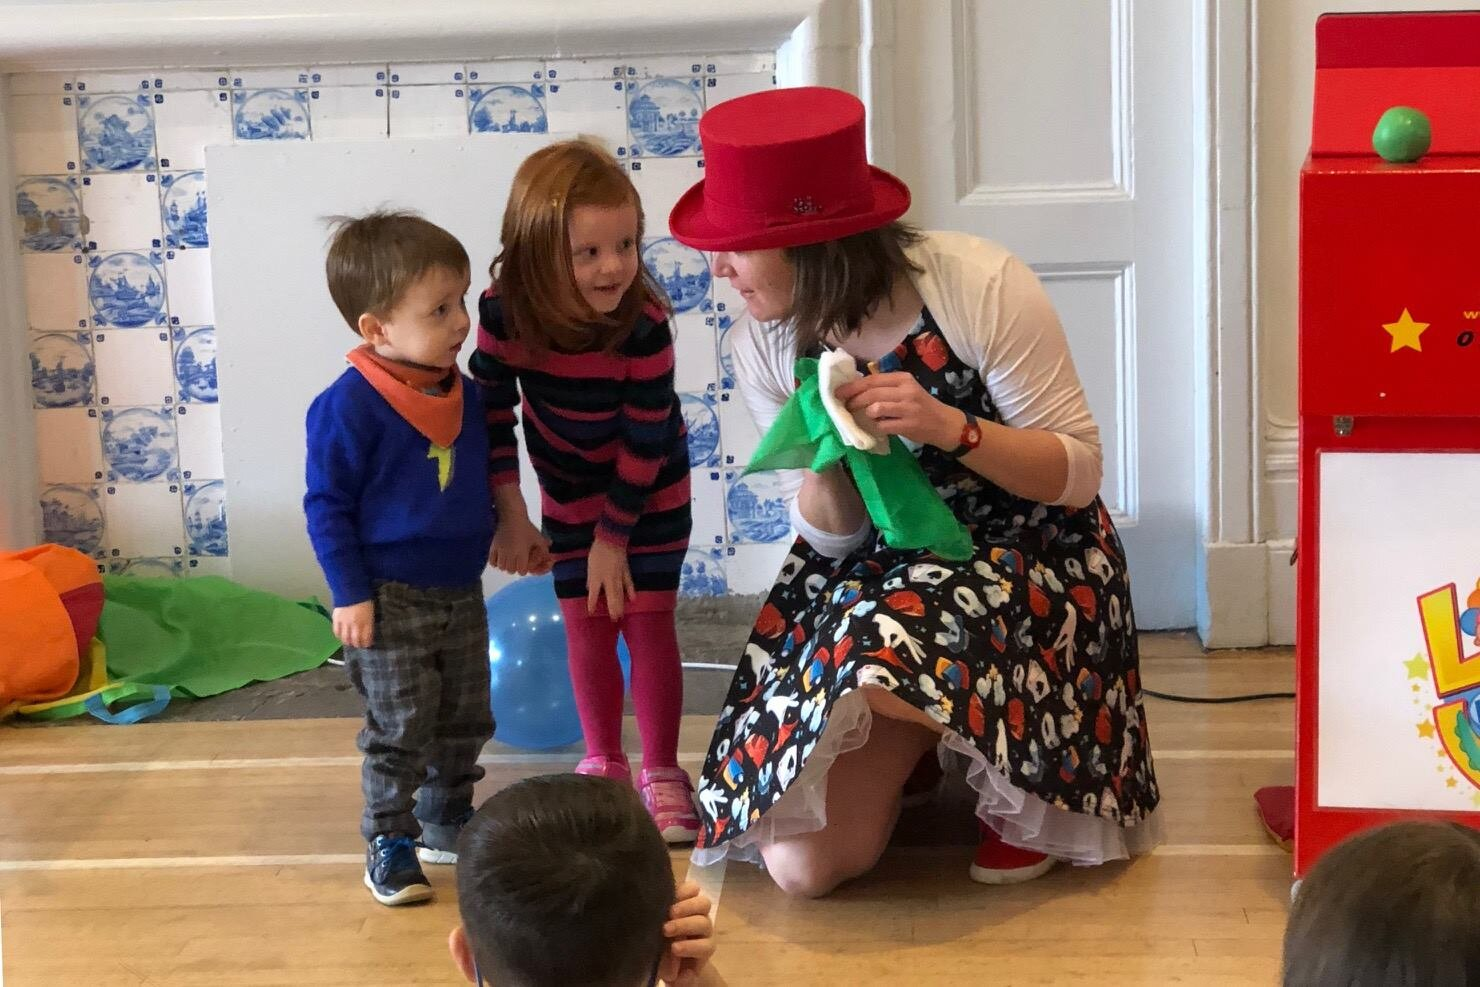 Circus Uncertainty Children's Entertainer